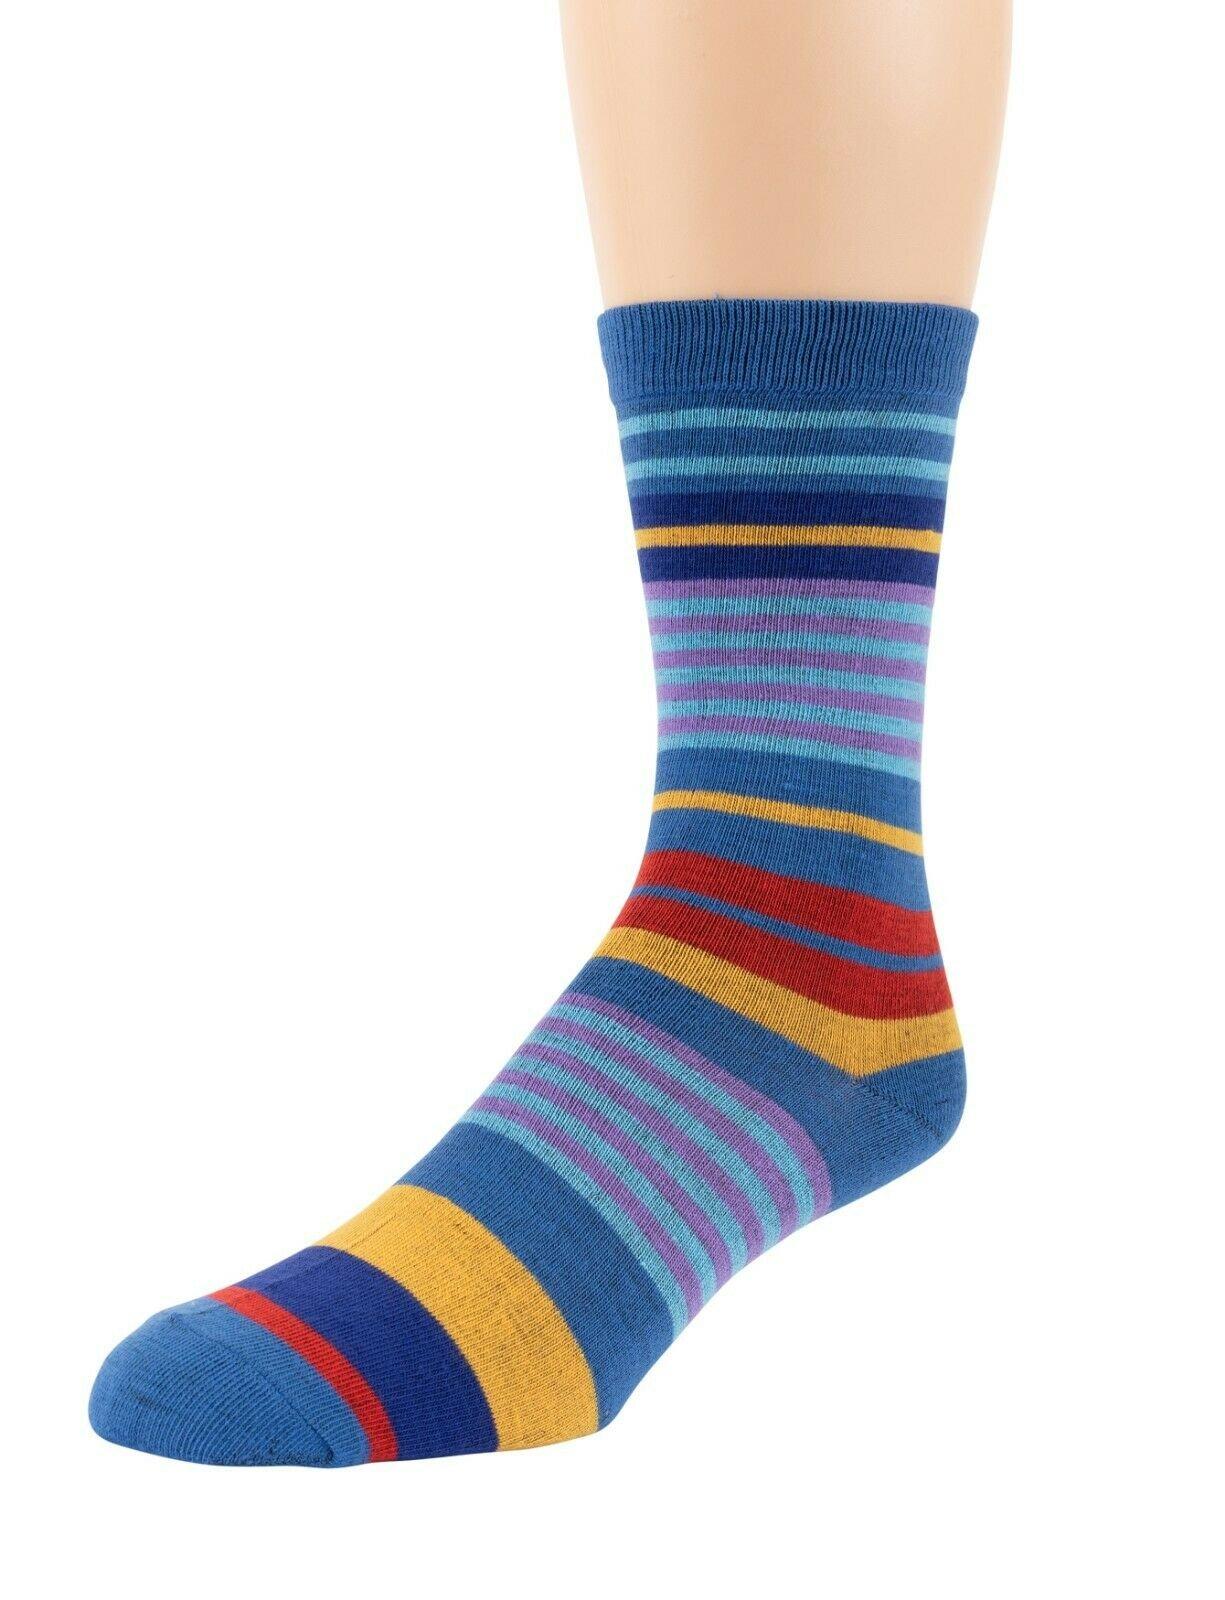 Mitch-Bogen-Mens-Cotton-Dress-Socks-Colorful-Fashion-Crew-Socks-8-Pack-Gift-Box thumbnail 14